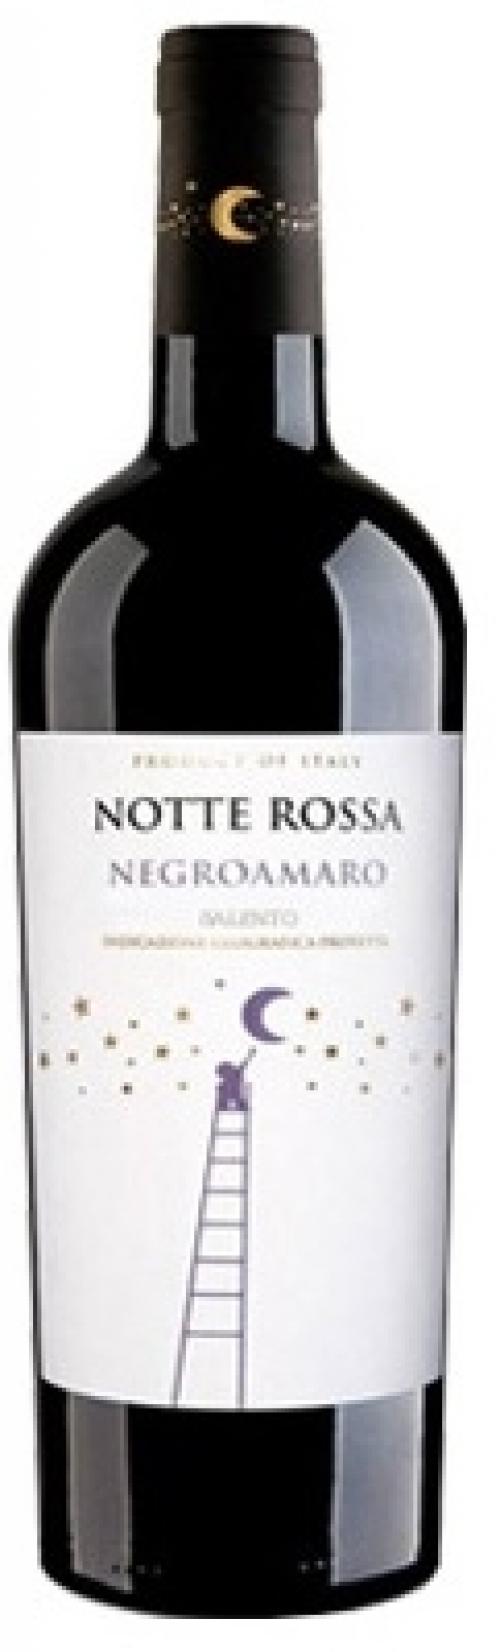 Rượu vang Notte Rossa Negroamaro Salento I.G.P Vintaga 2015